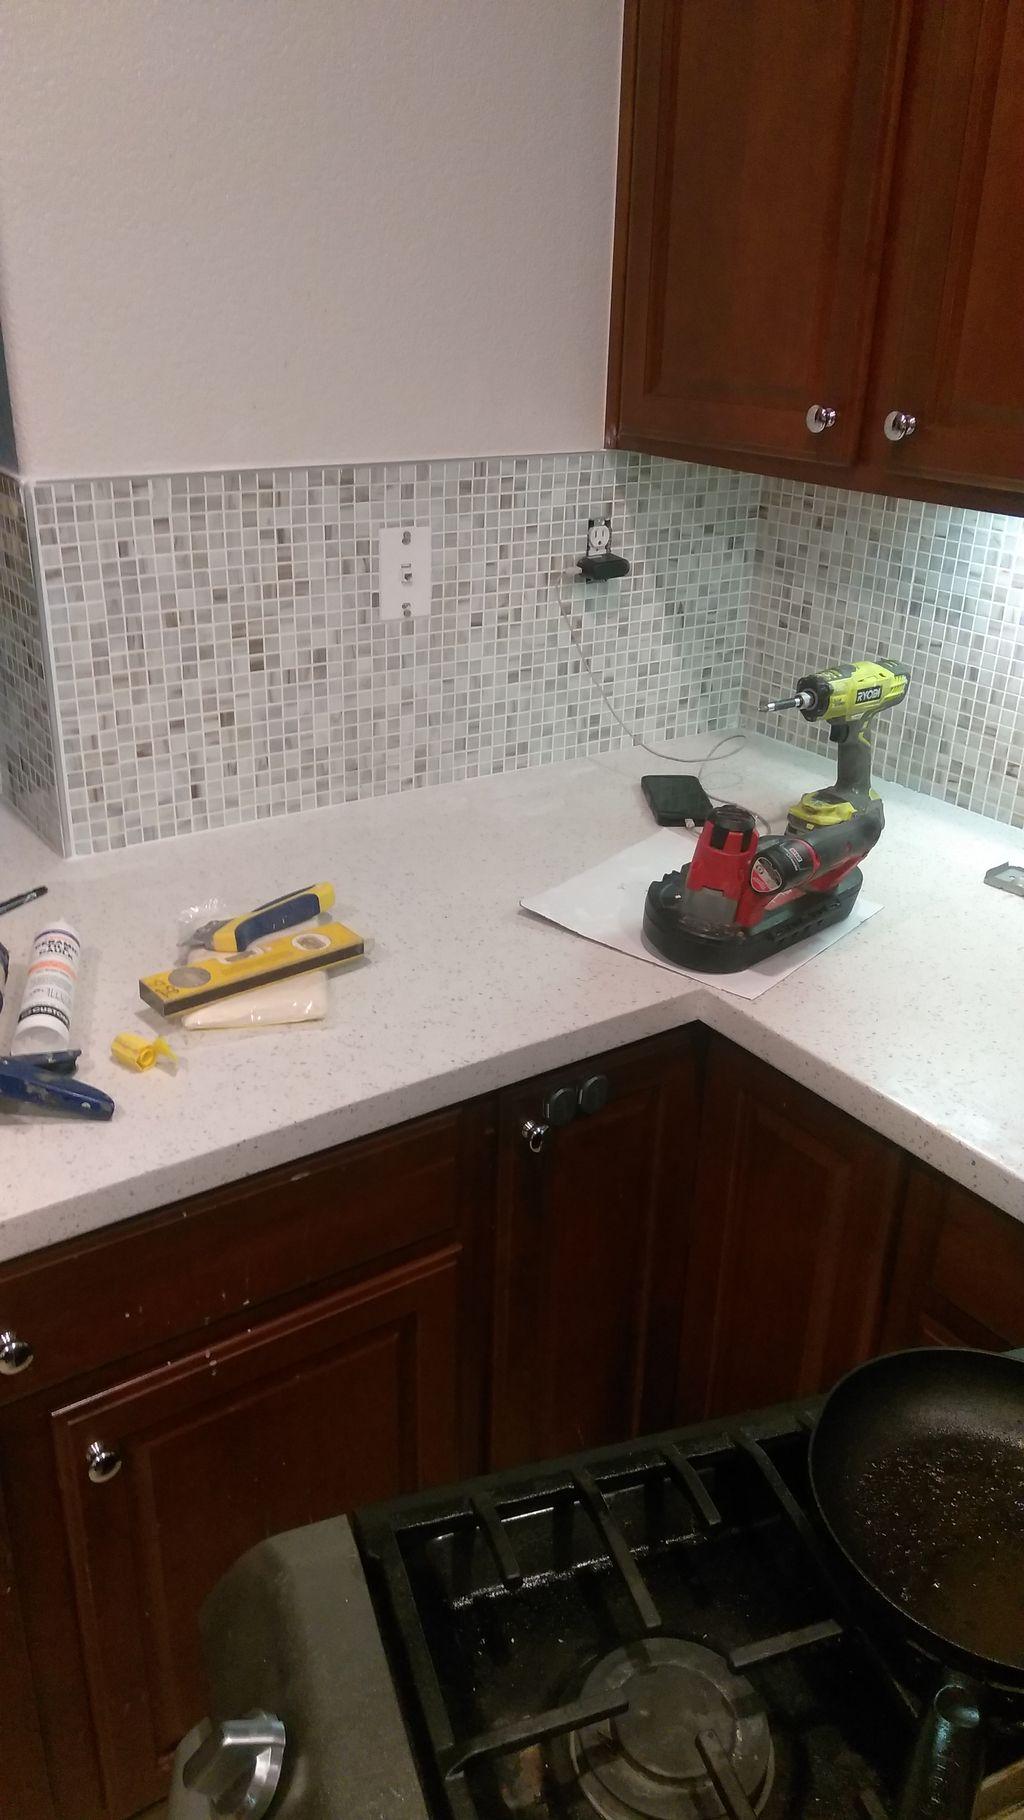 Counter top and backsplash